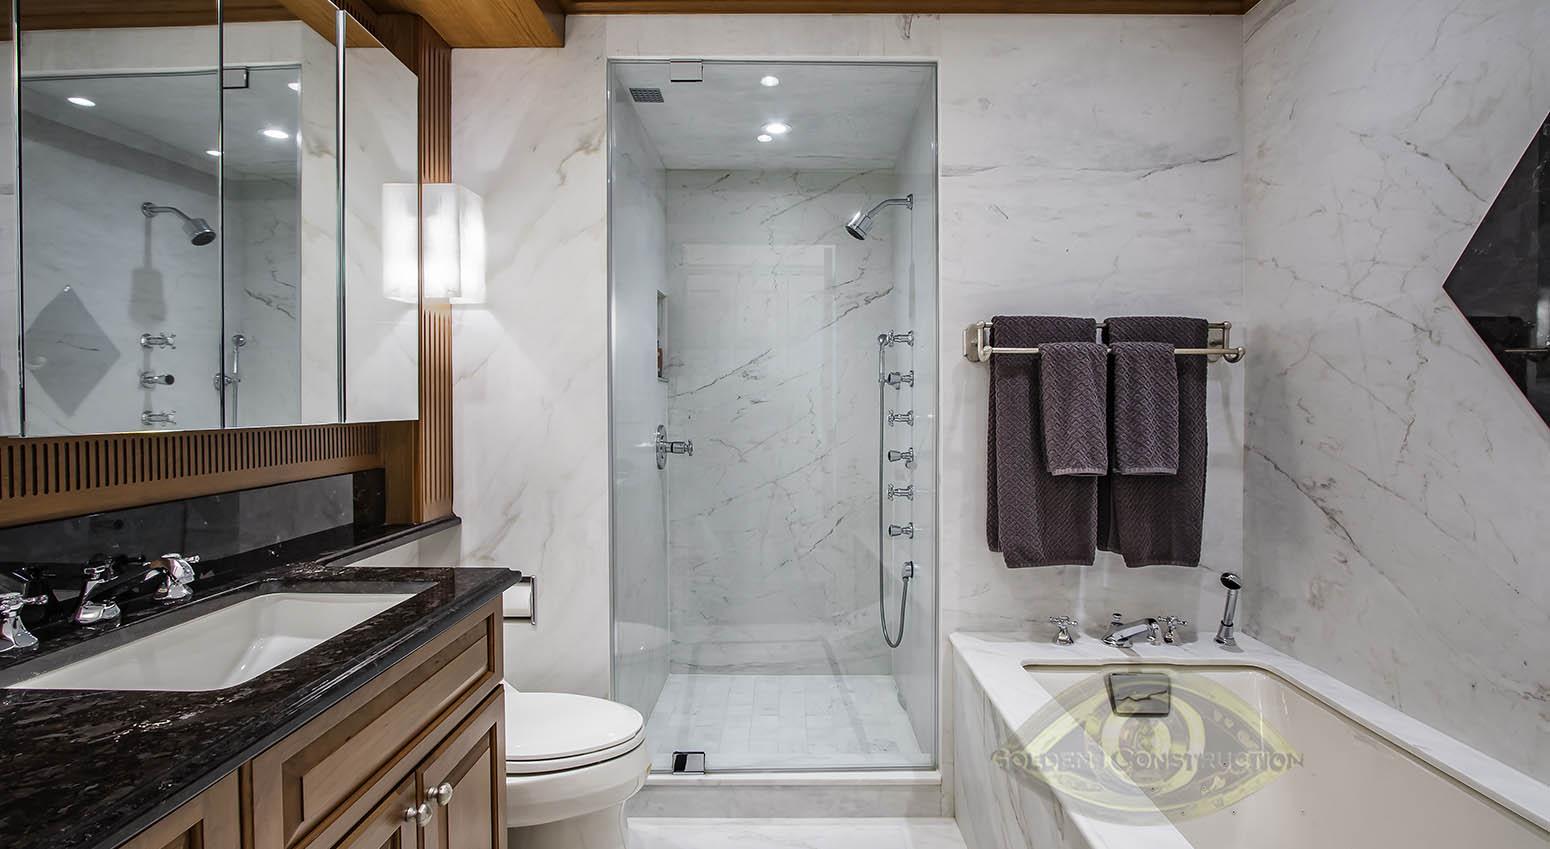 bathroom-renovation-nyc-21 – Golden I Construction